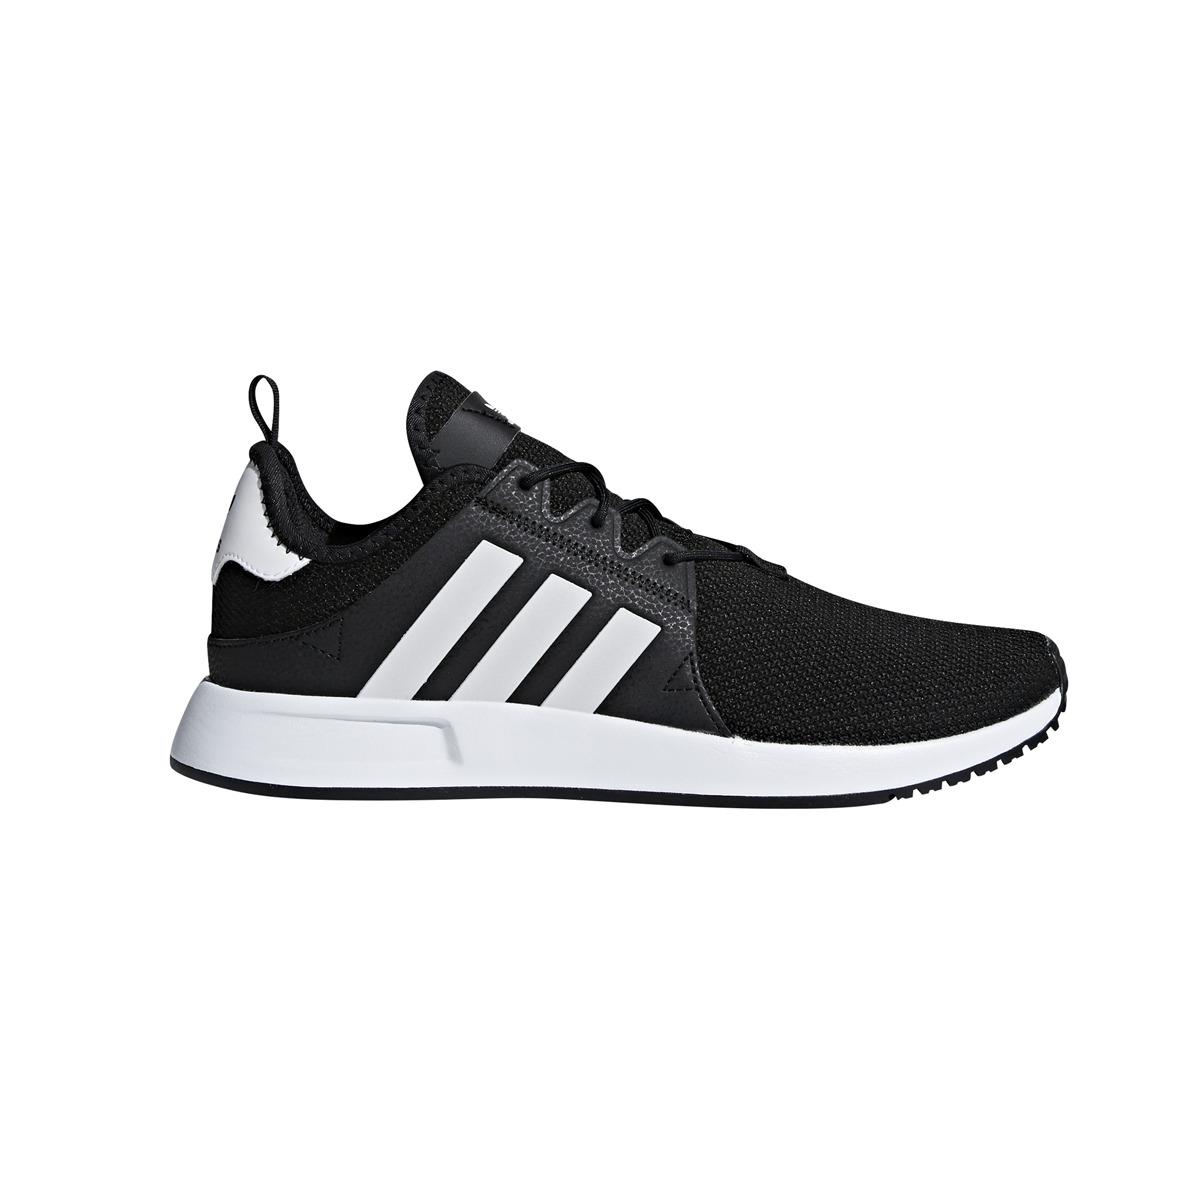 Zapatillas Ngbl Originals plr Moda Hombre I X Adidas bgmf7vYyI6